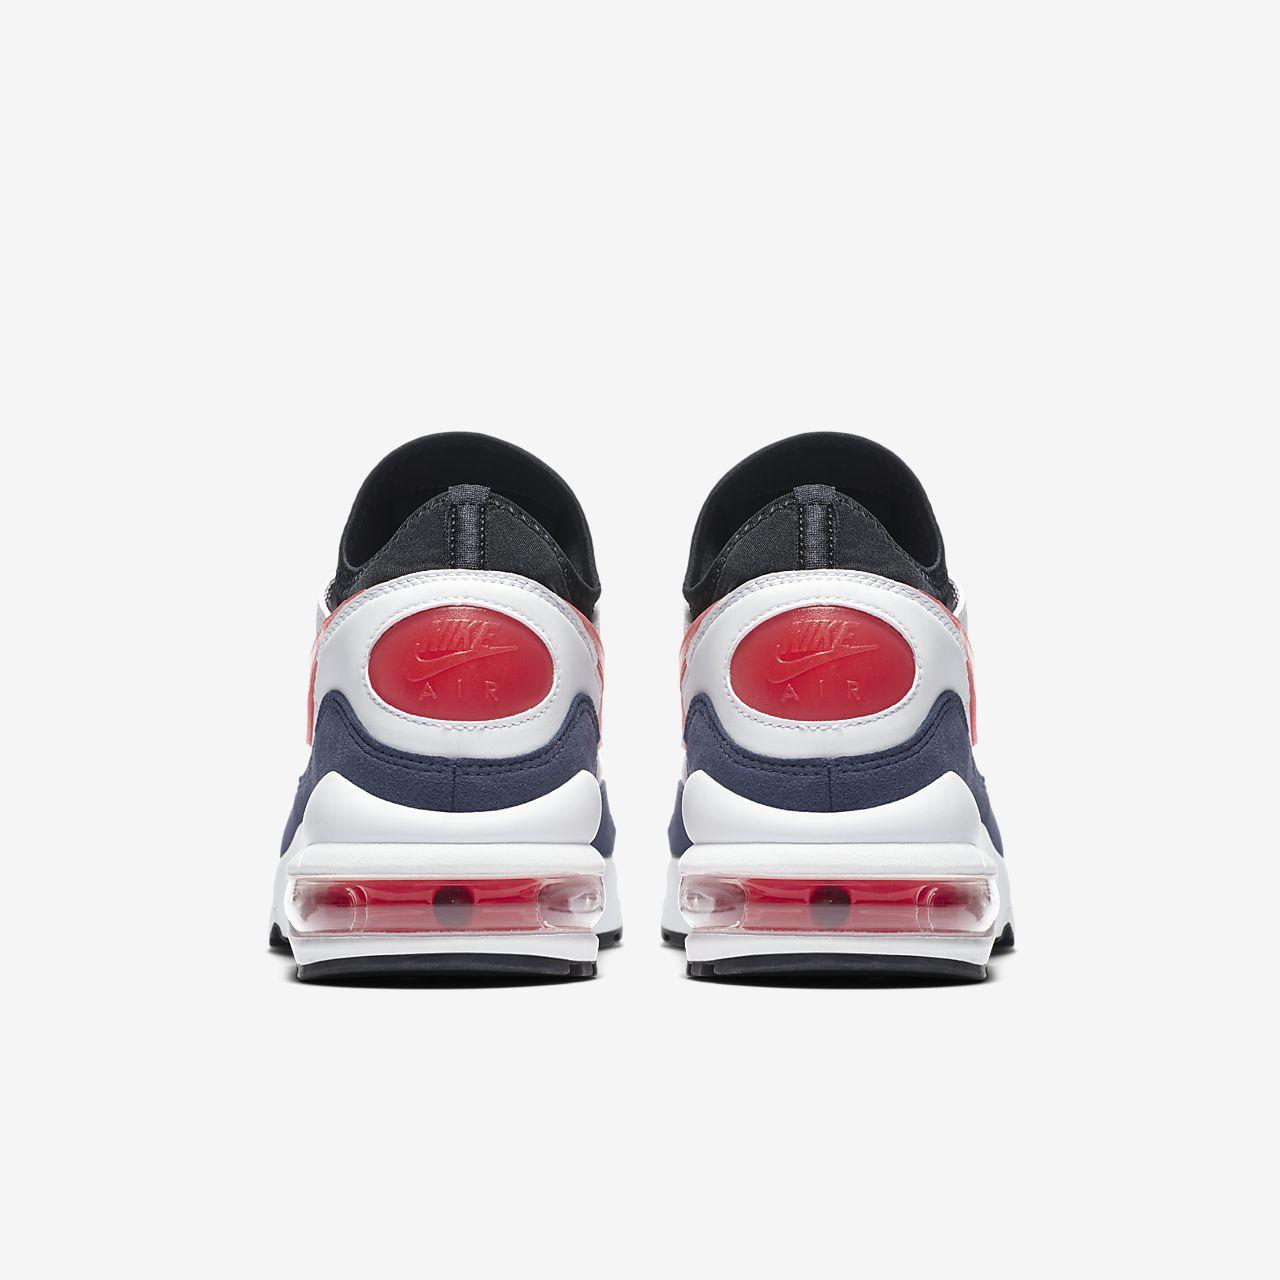 buy online fed86 30432 ... Nike Air Max 93 Mens Shoe